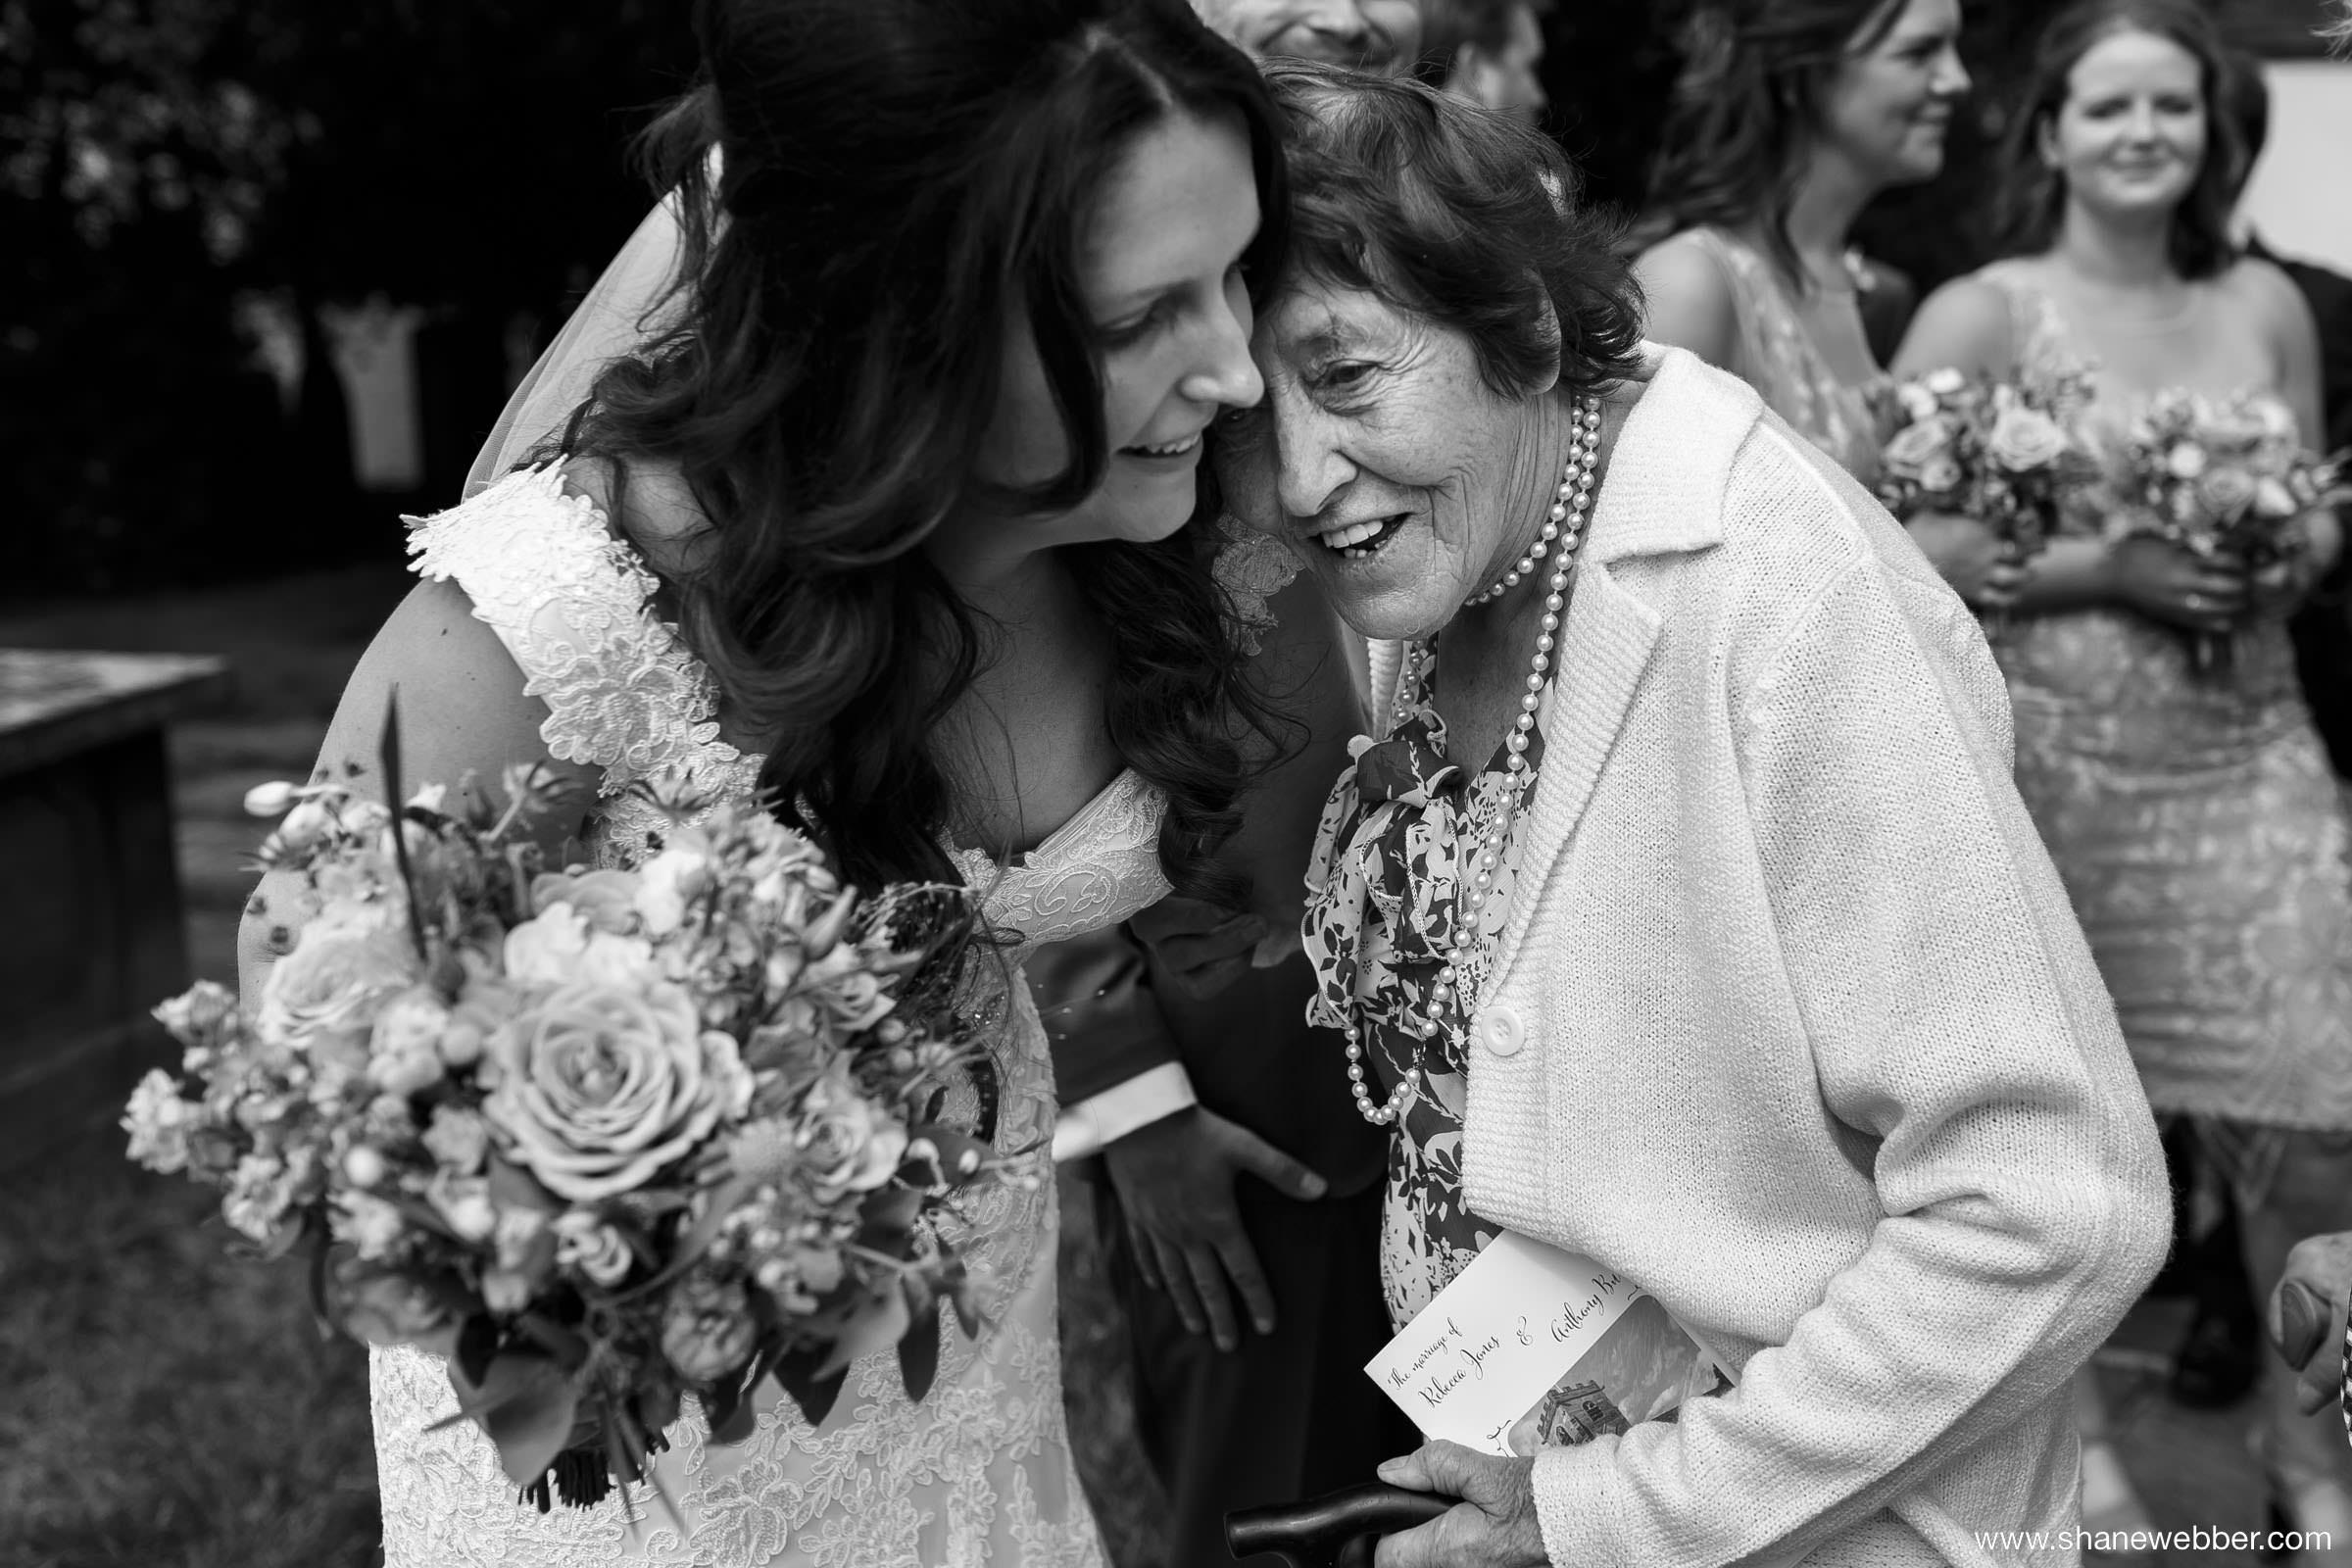 Emotional wedding photo of elderly guest